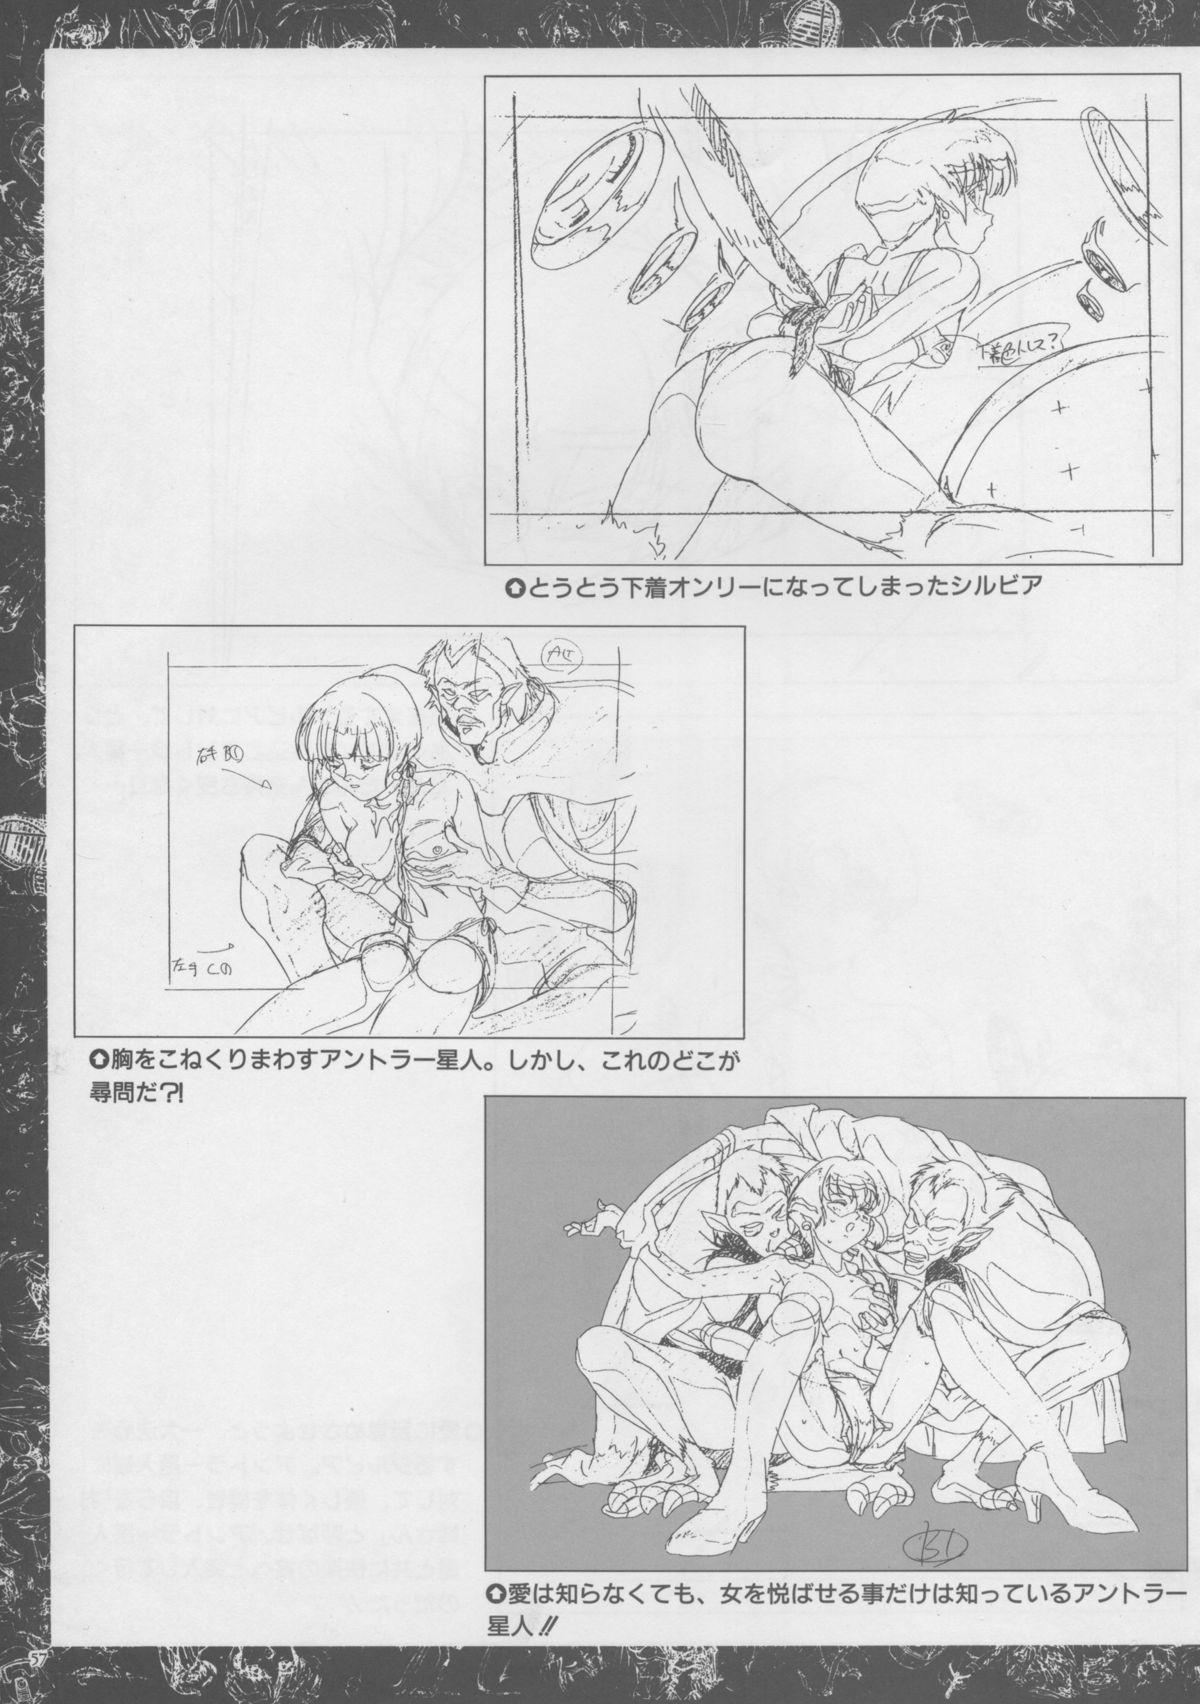 VIPER Series Official Artbook 55